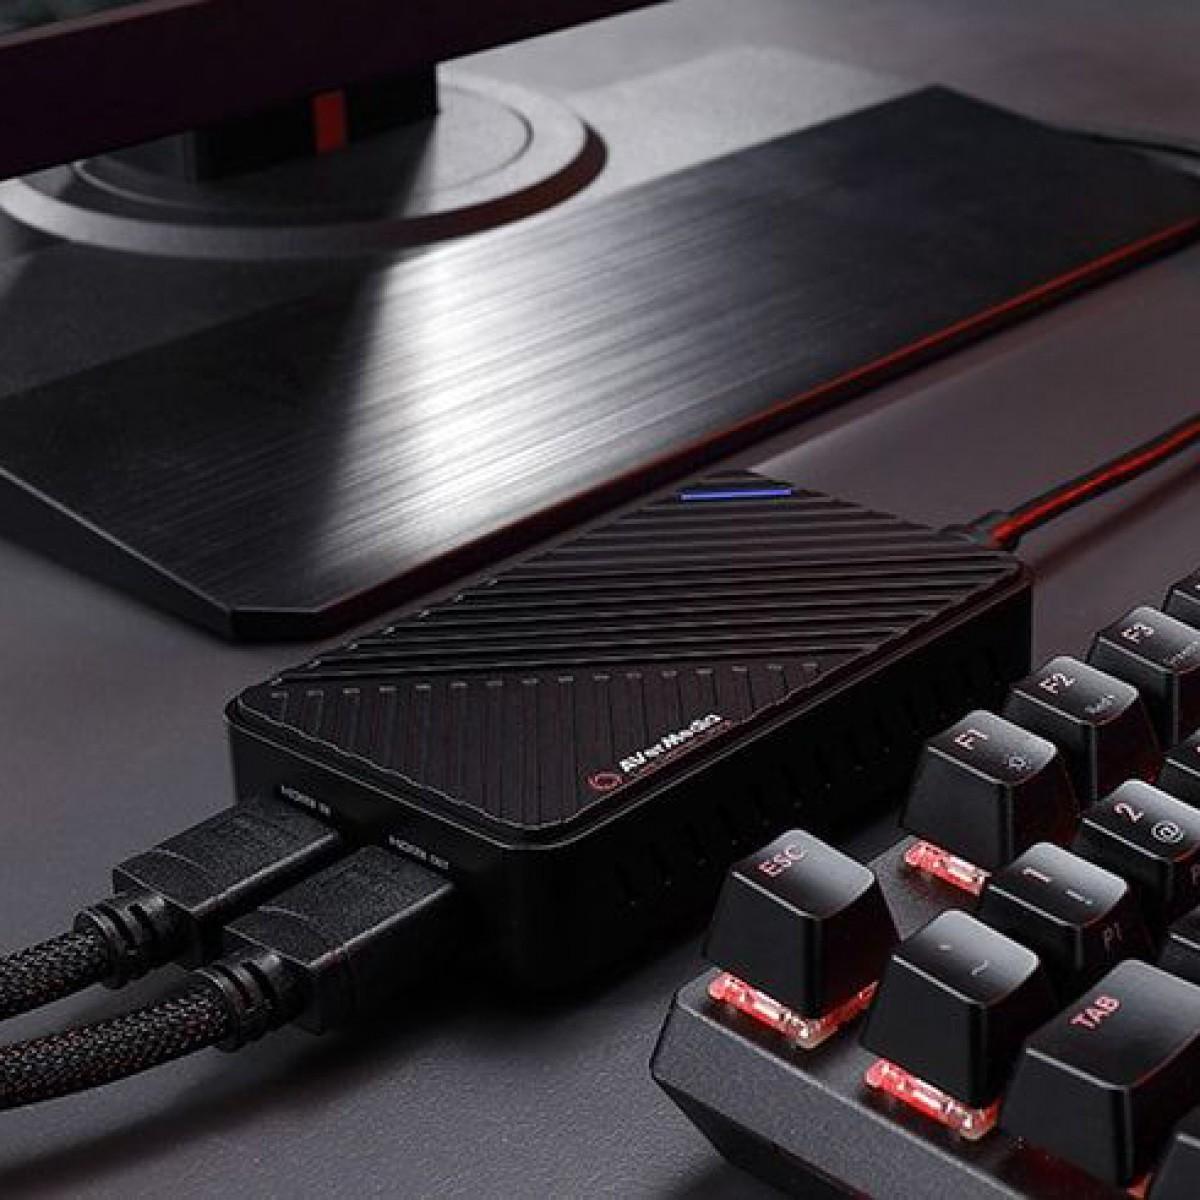 Placa de Captura Avermedia 4K Live Gamer Ultra, Interface USB 3.1, GC553